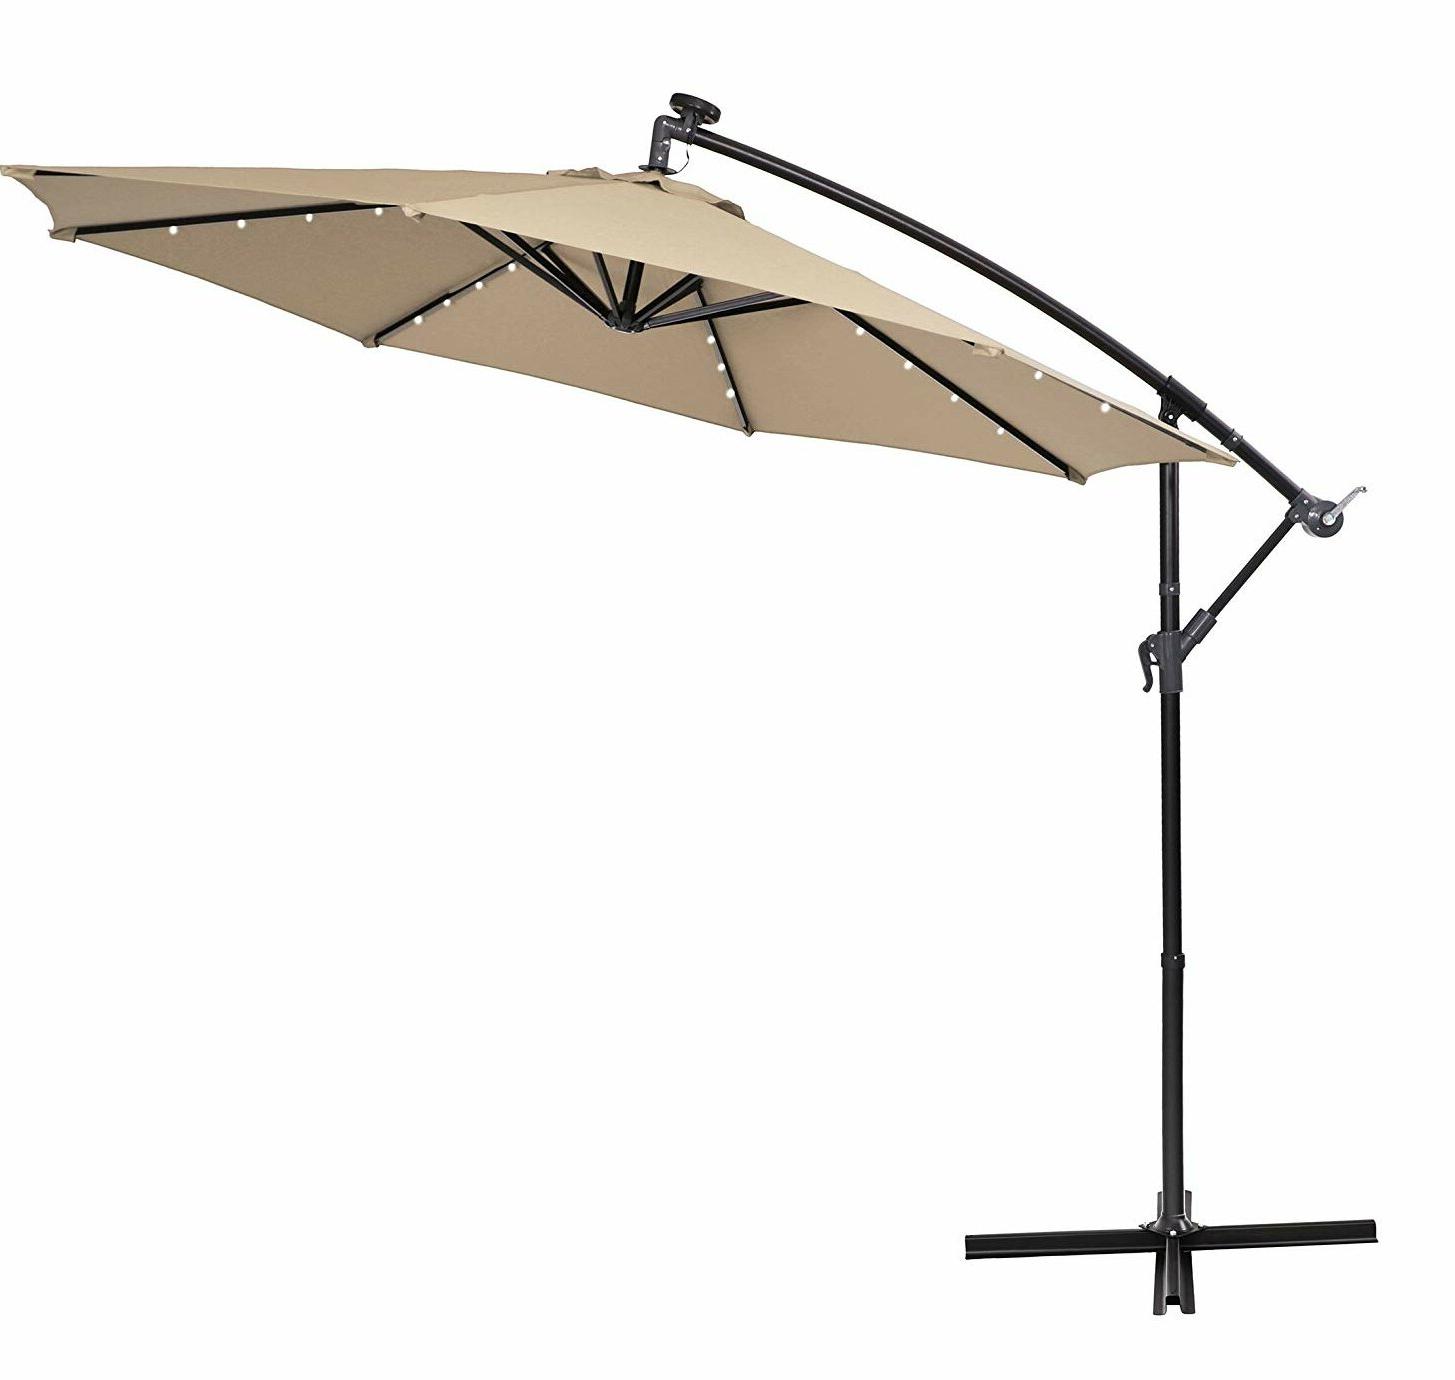 Annabelle Market Umbrellas Regarding Recent Phi Villa 10' Cantilever Umbrella & Reviews (View 7 of 20)